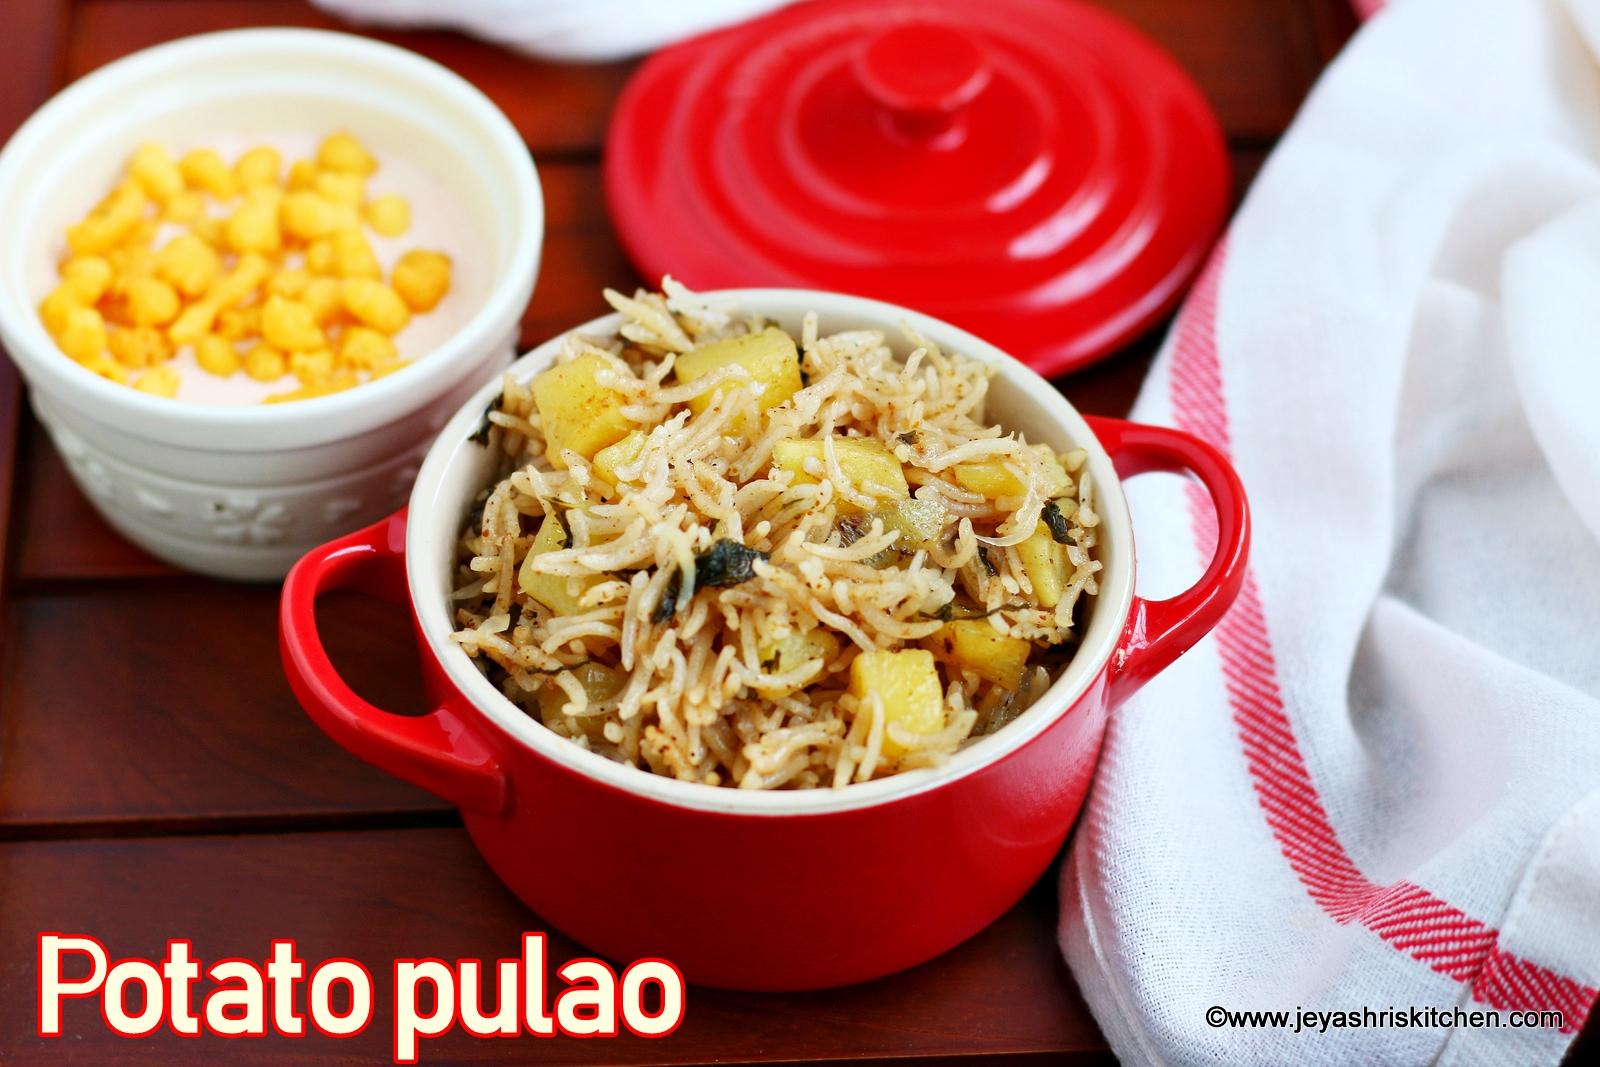 Jeyashris kitchen a vegetarian food blog with detailed step wise potato pulao recipe how to make aloo pulao forumfinder Choice Image